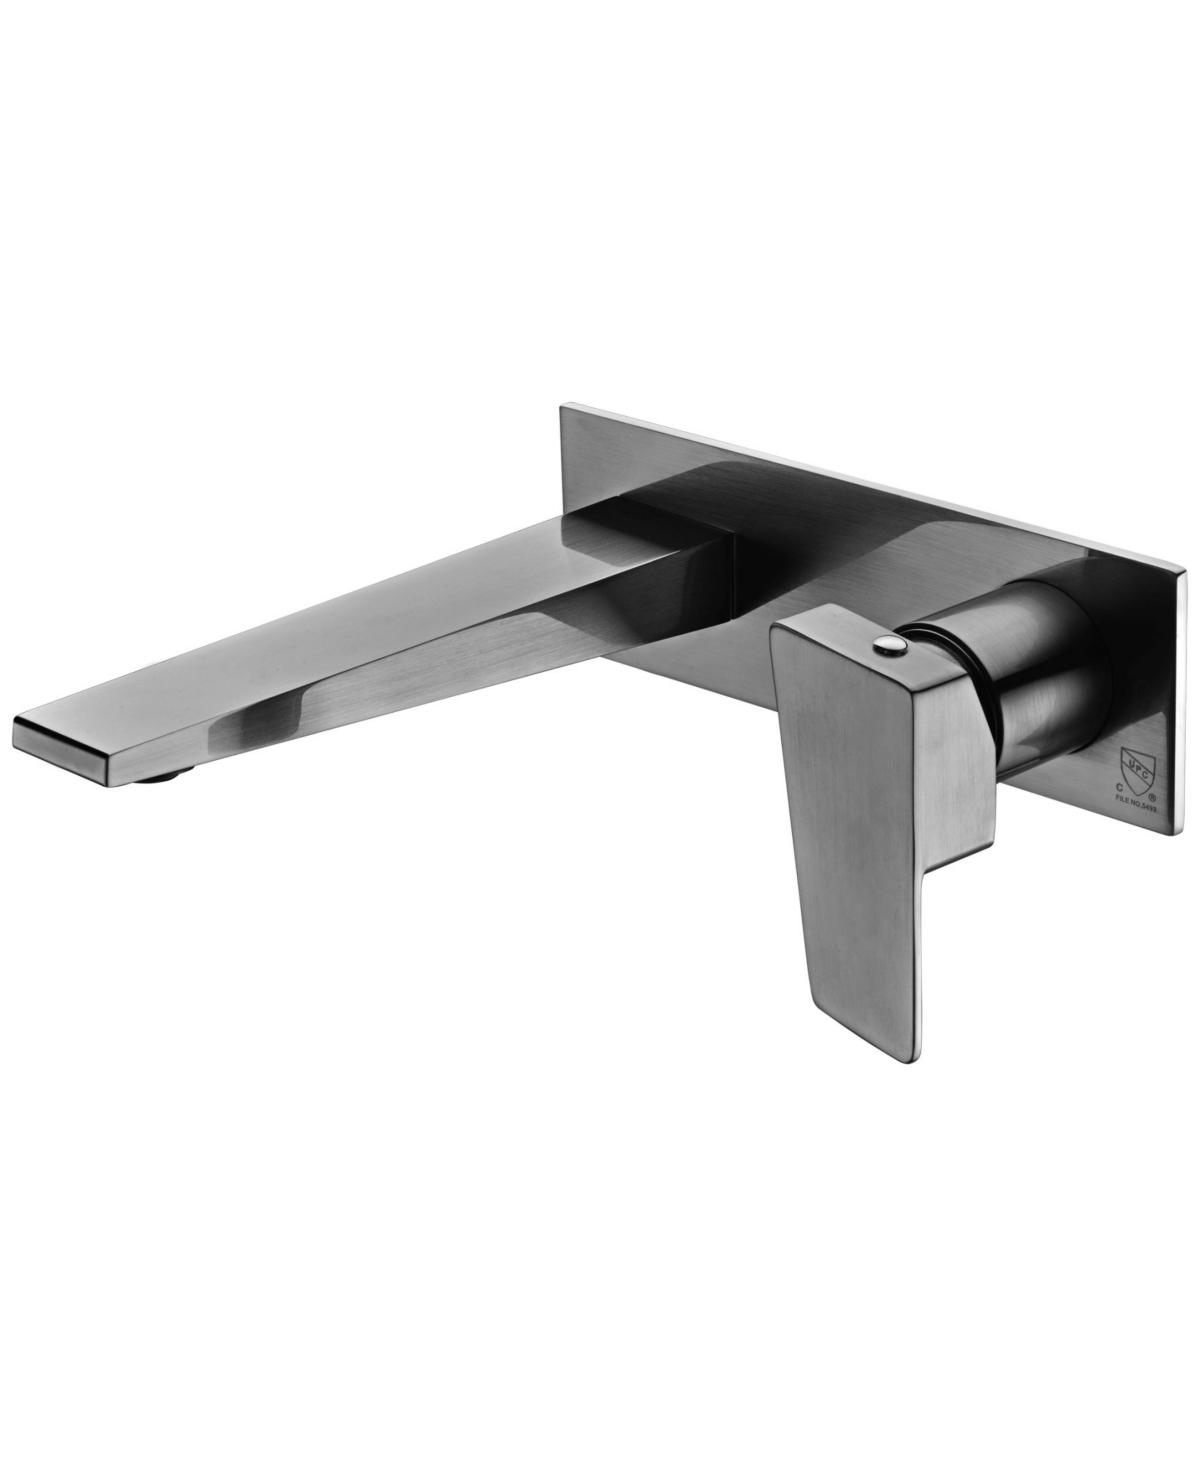 Alfi brand Brushed Nickel Wall Mounted Bathroom Faucet Bedding